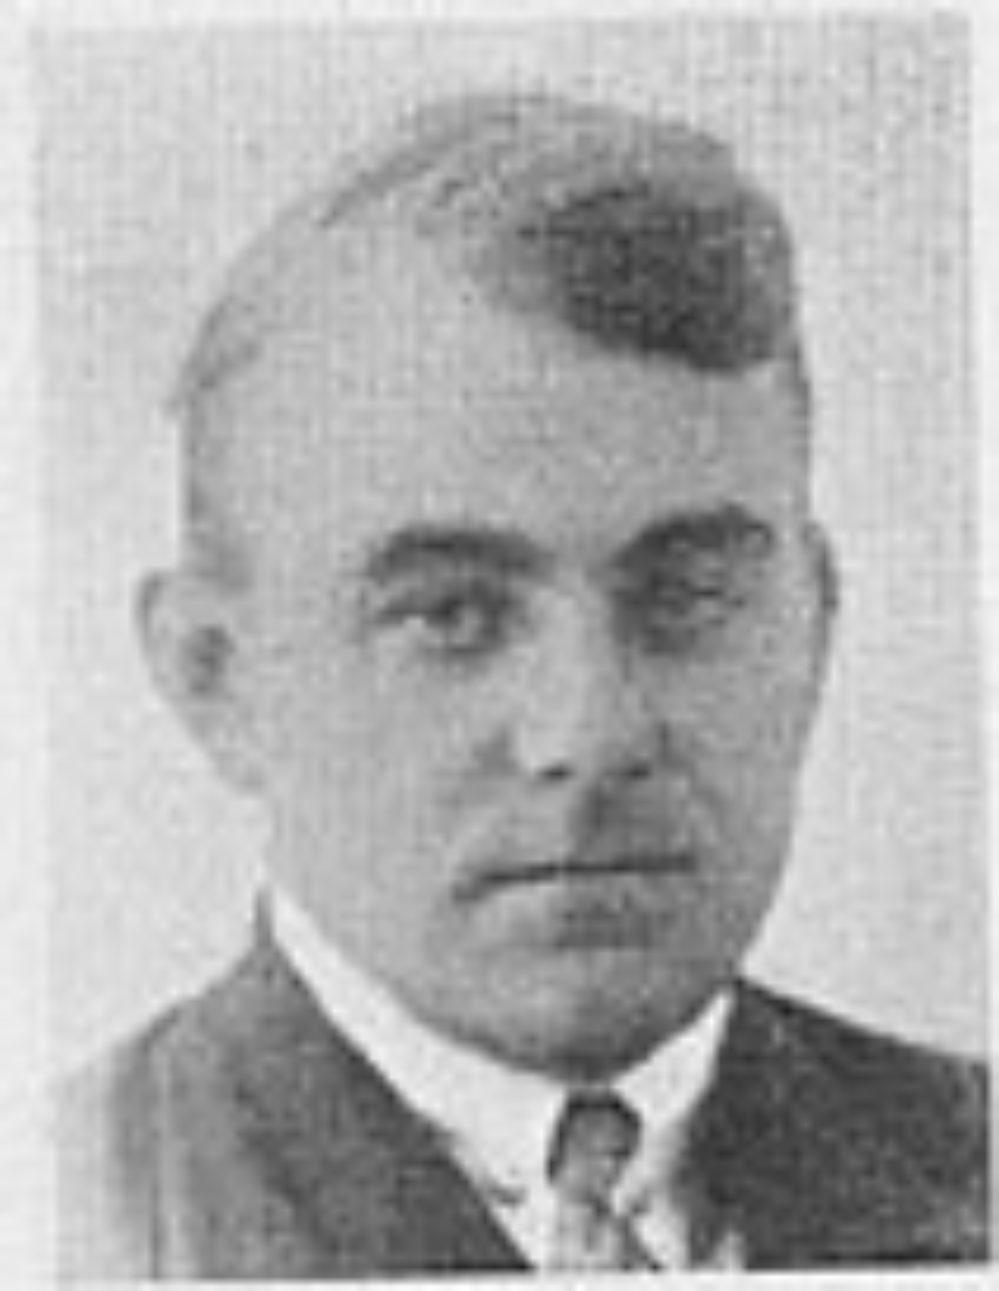 Håkon Bernhard Johansen